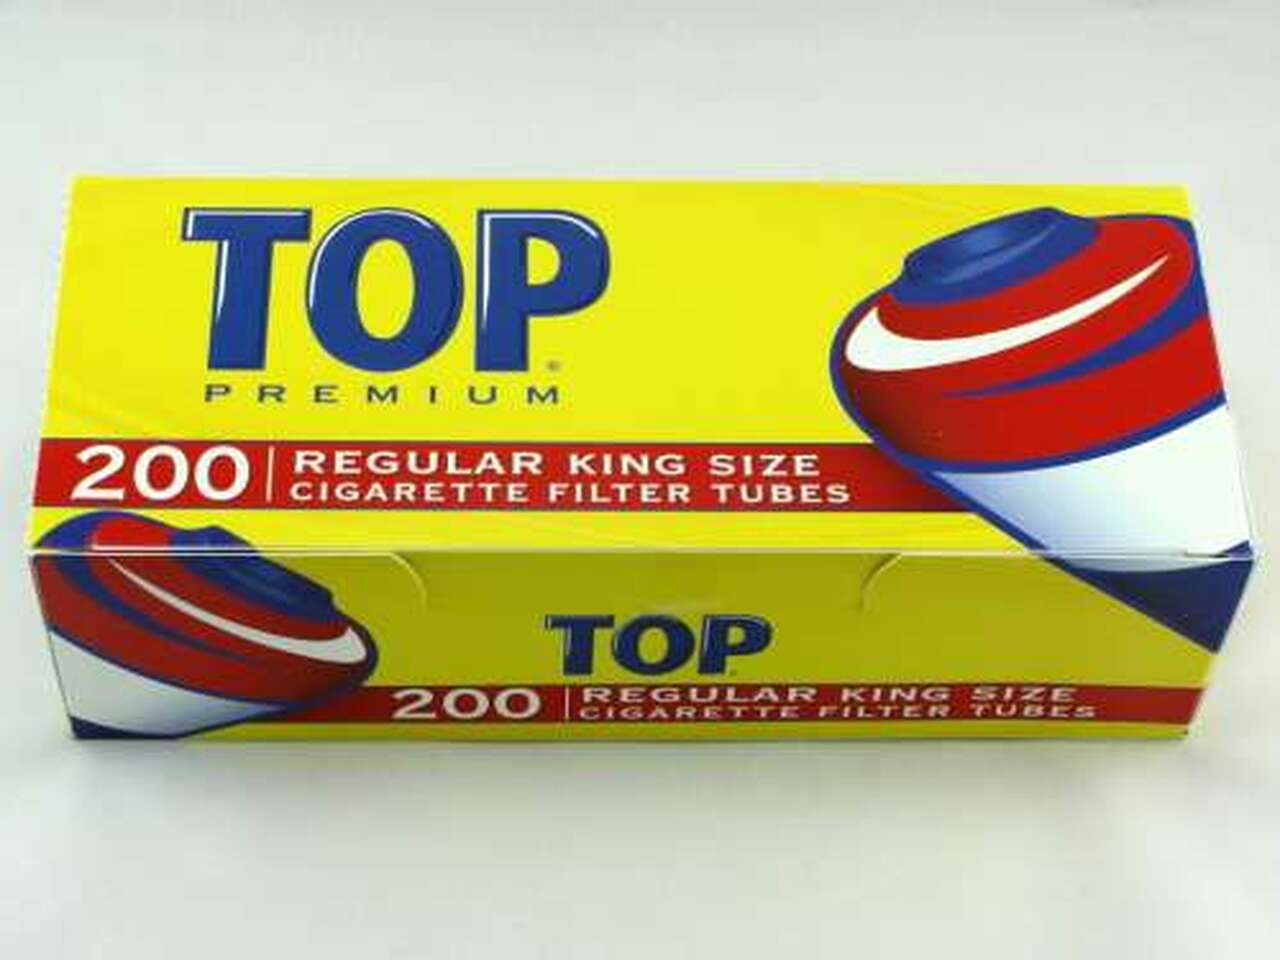 Top Full Flavor King Size Cigarette Tubes